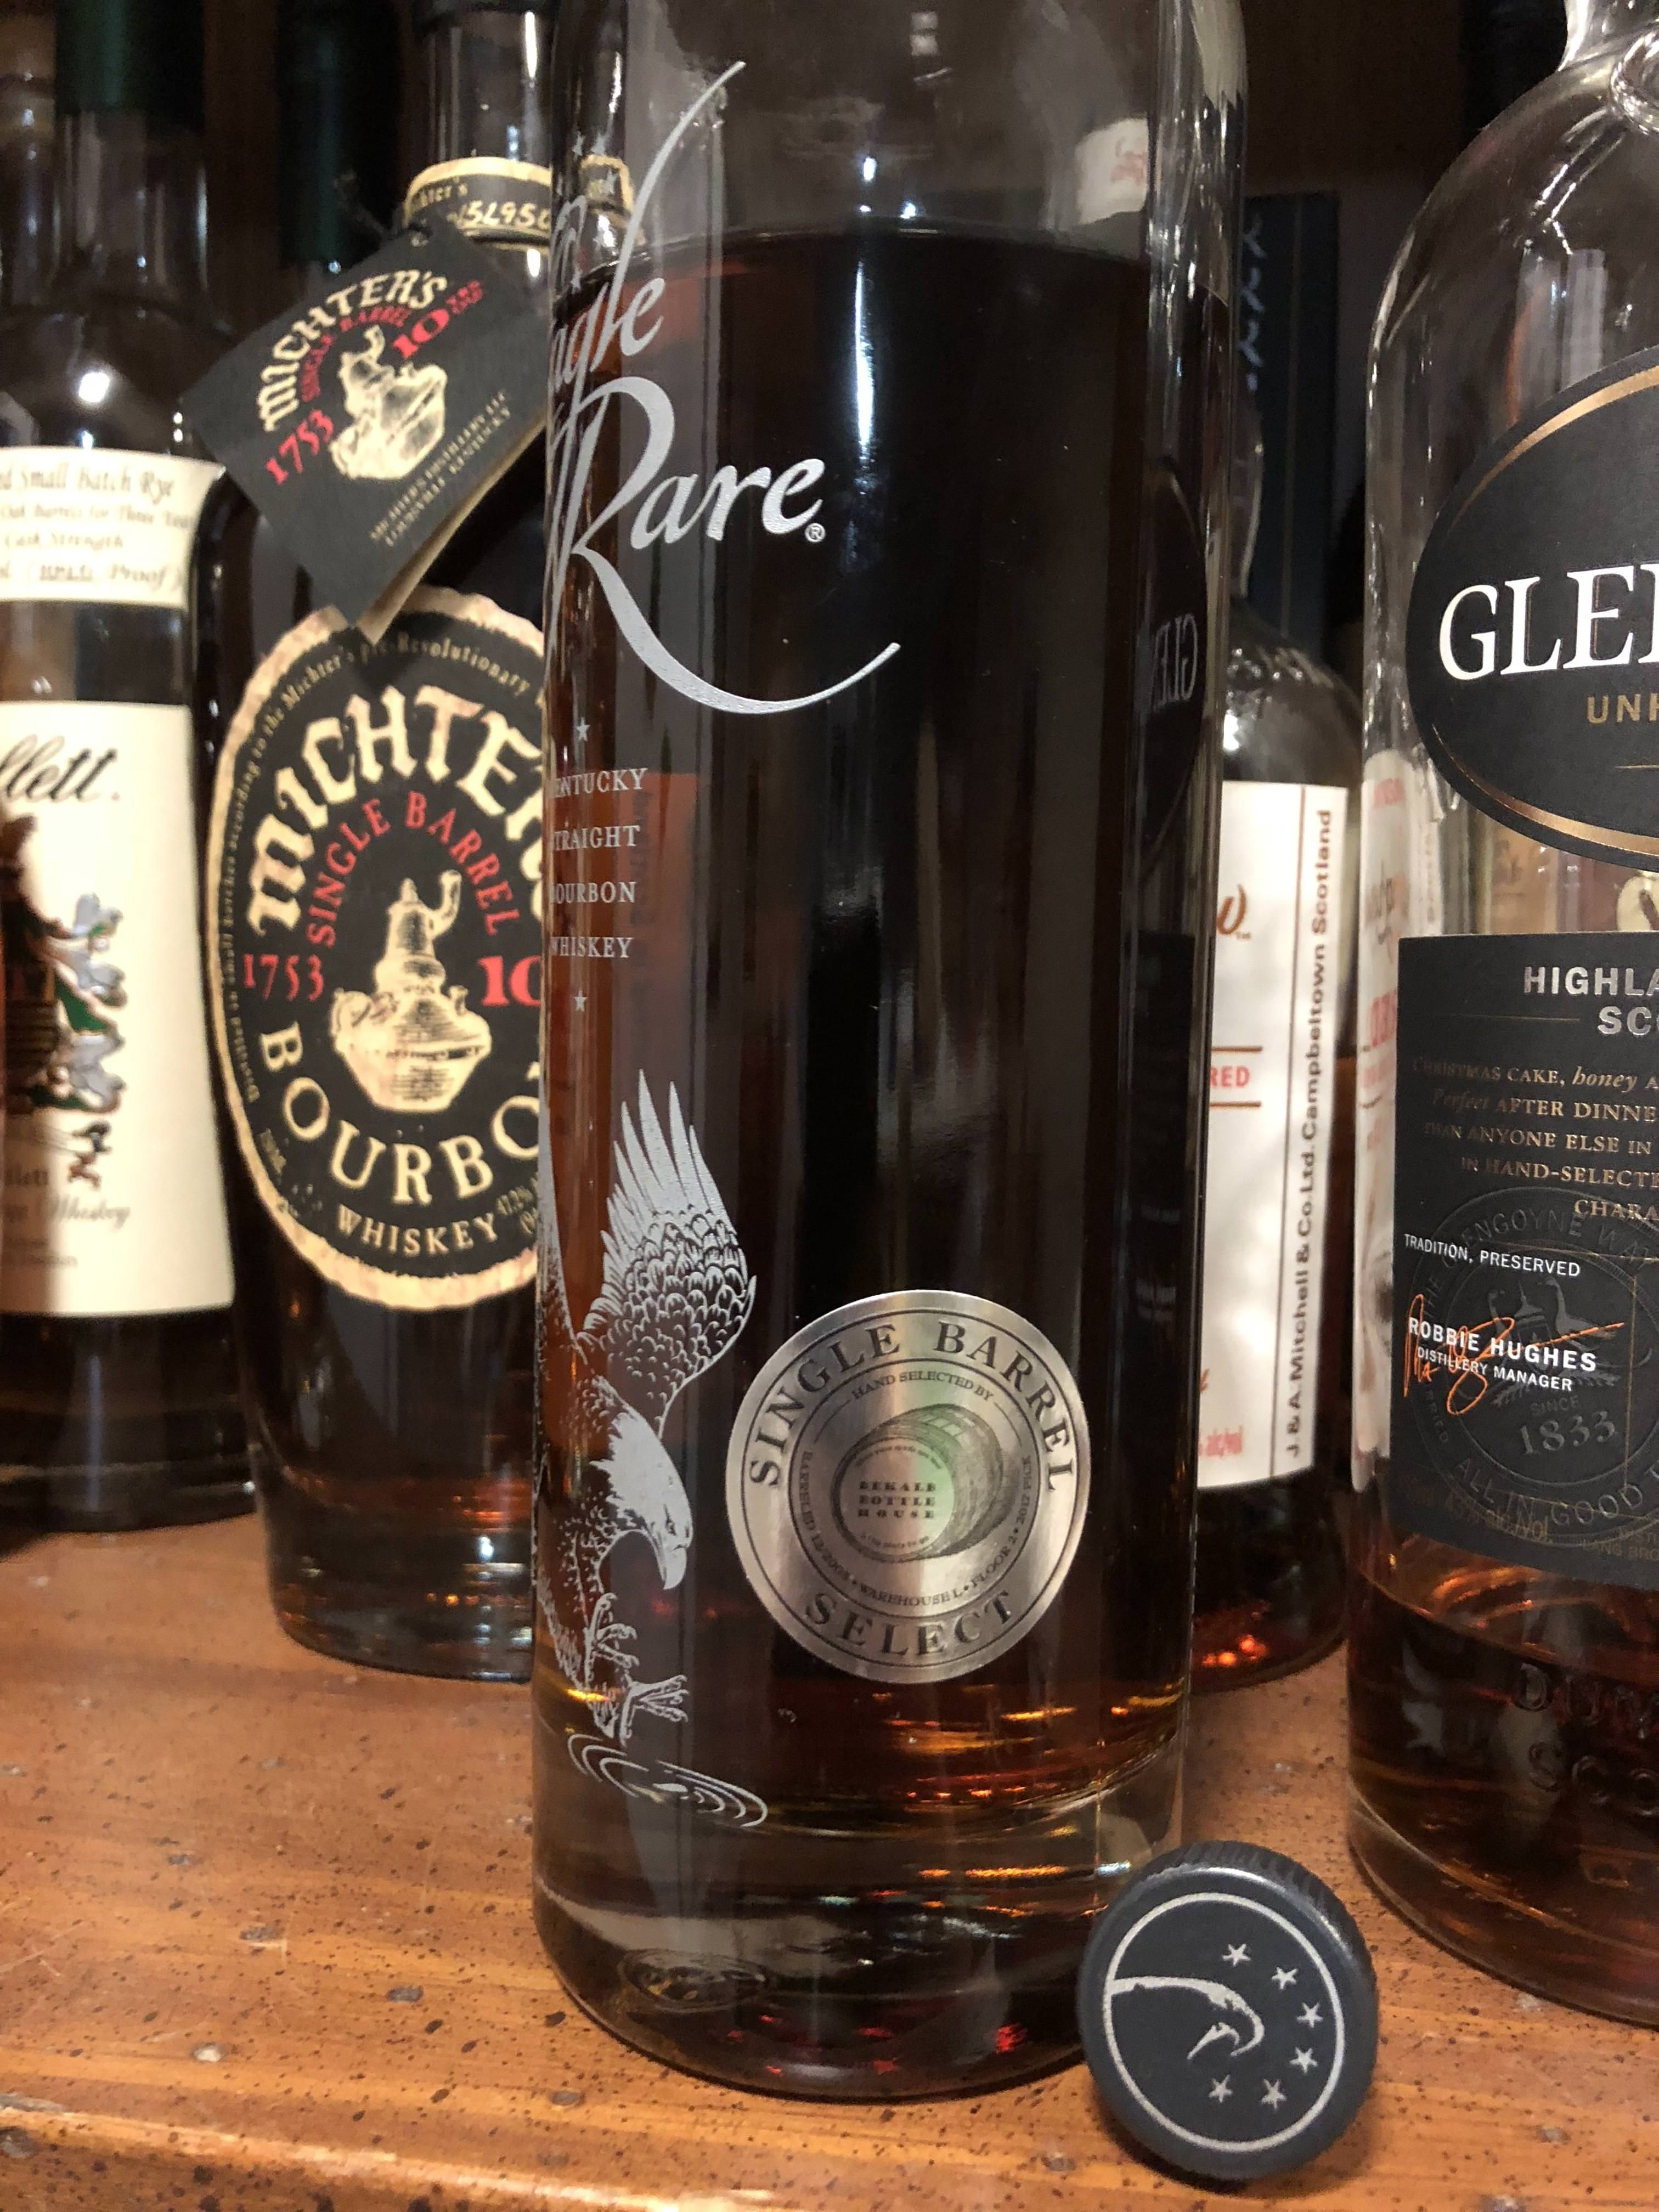 Eagle rare dekalb bottle house review 30 httpifttt